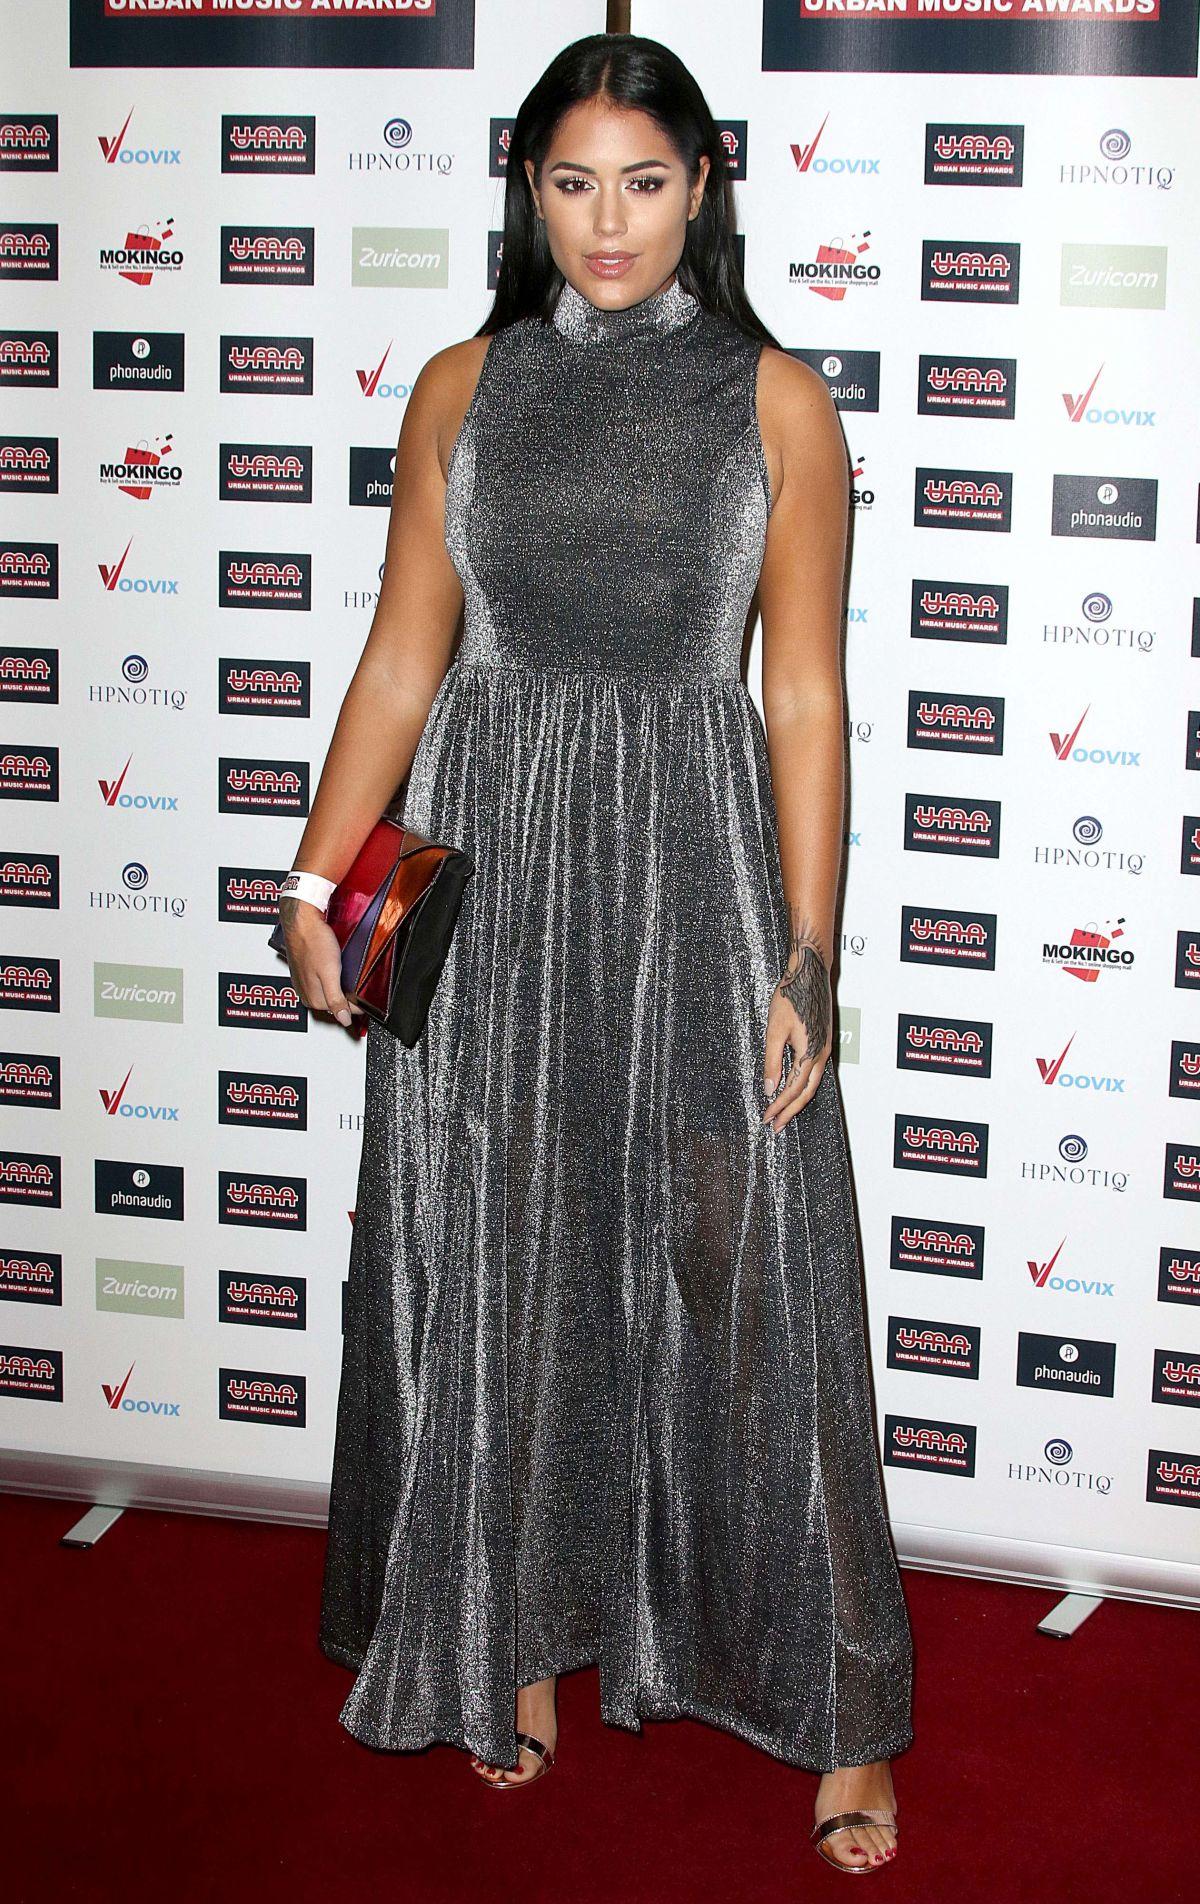 MALIN ANDERSSON at Urban Music Awards 2016 in London 11/26/2016